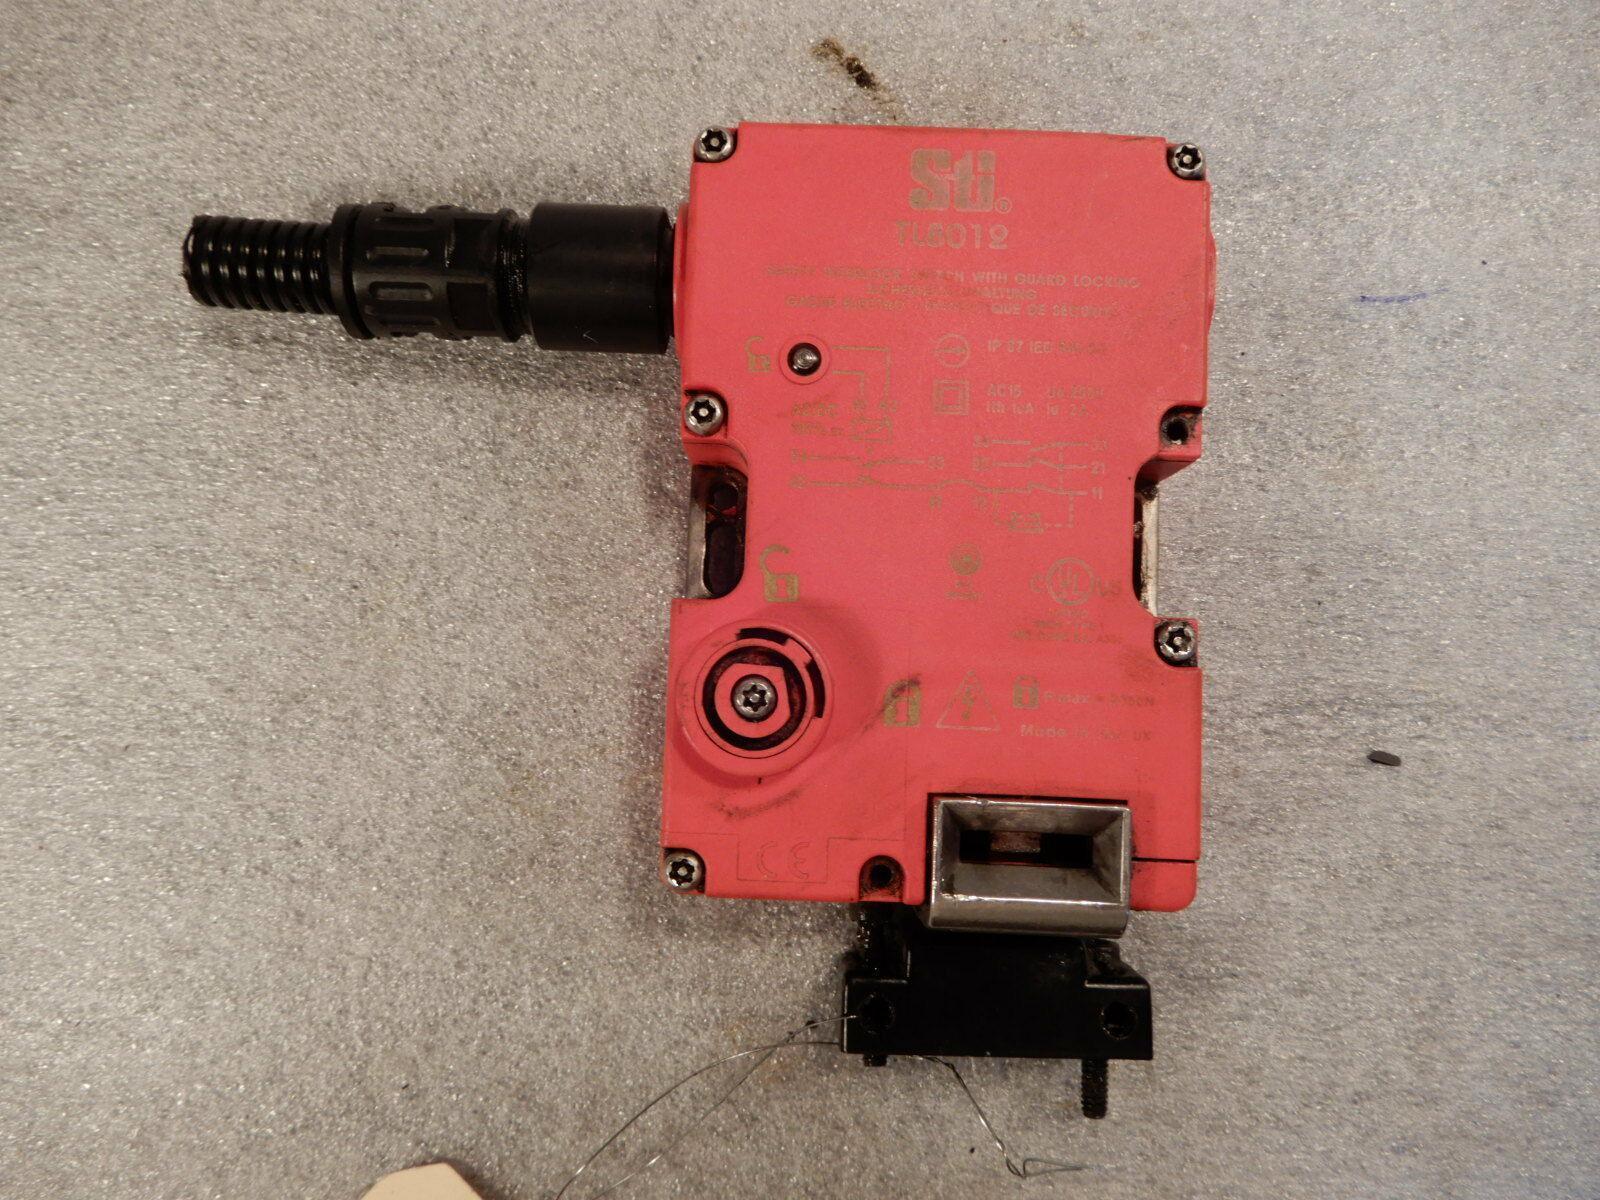 Omron Safety (STI) Safety Door Lock with Key, Safety Interlock Switch TL8012.